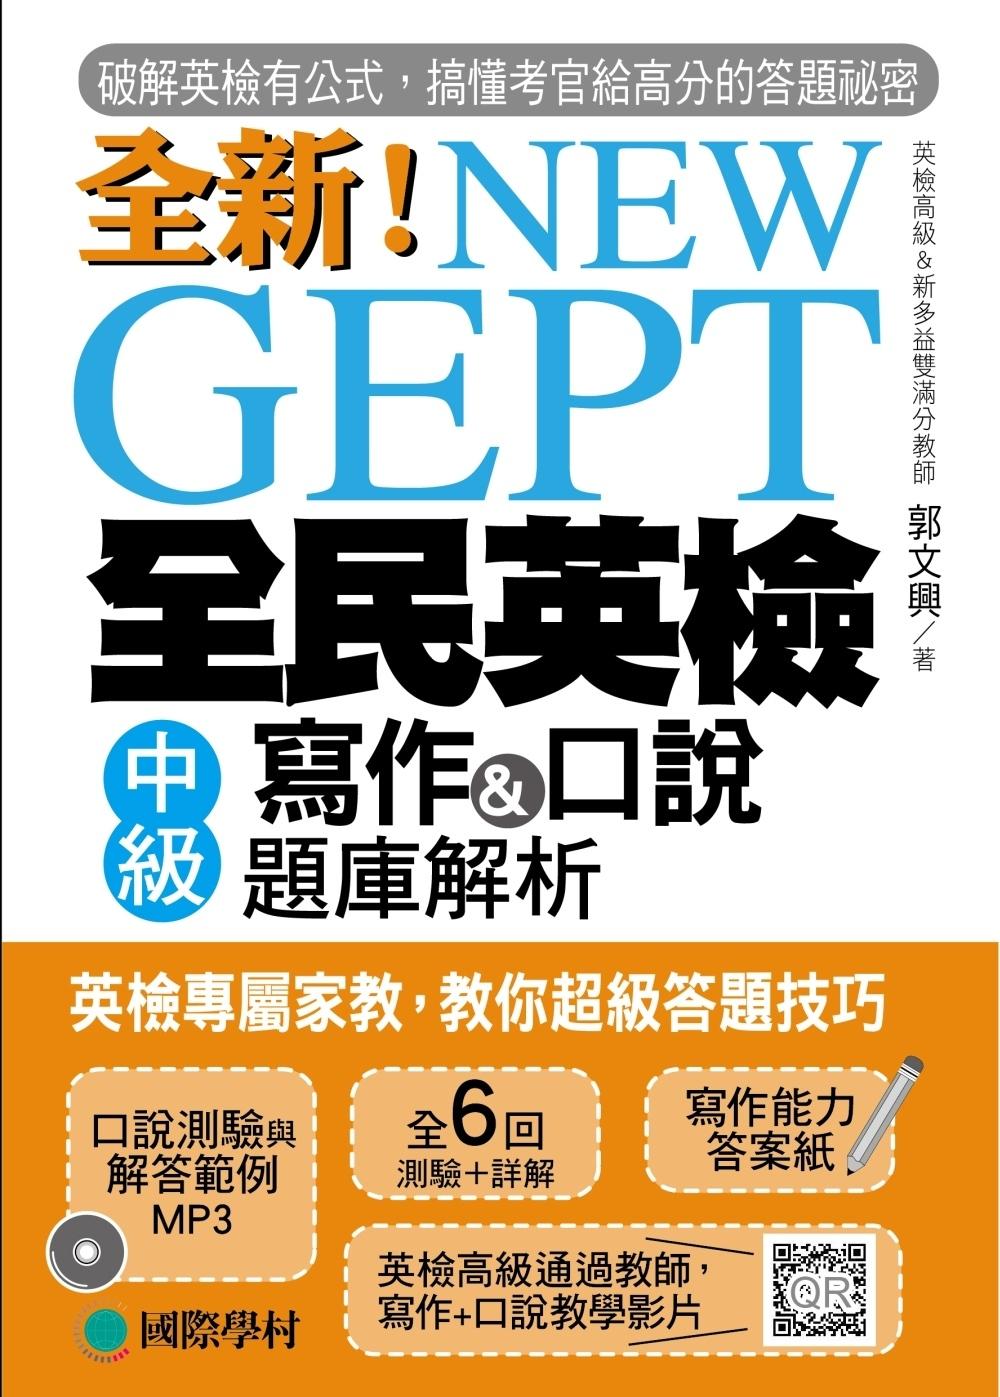 NEW GEPT 全新全民英檢中級寫作&口說題庫解析:英檢高級、新多益雙滿分名師,教你超級答題技巧!(附口說測驗MP3+教學影片QR碼)